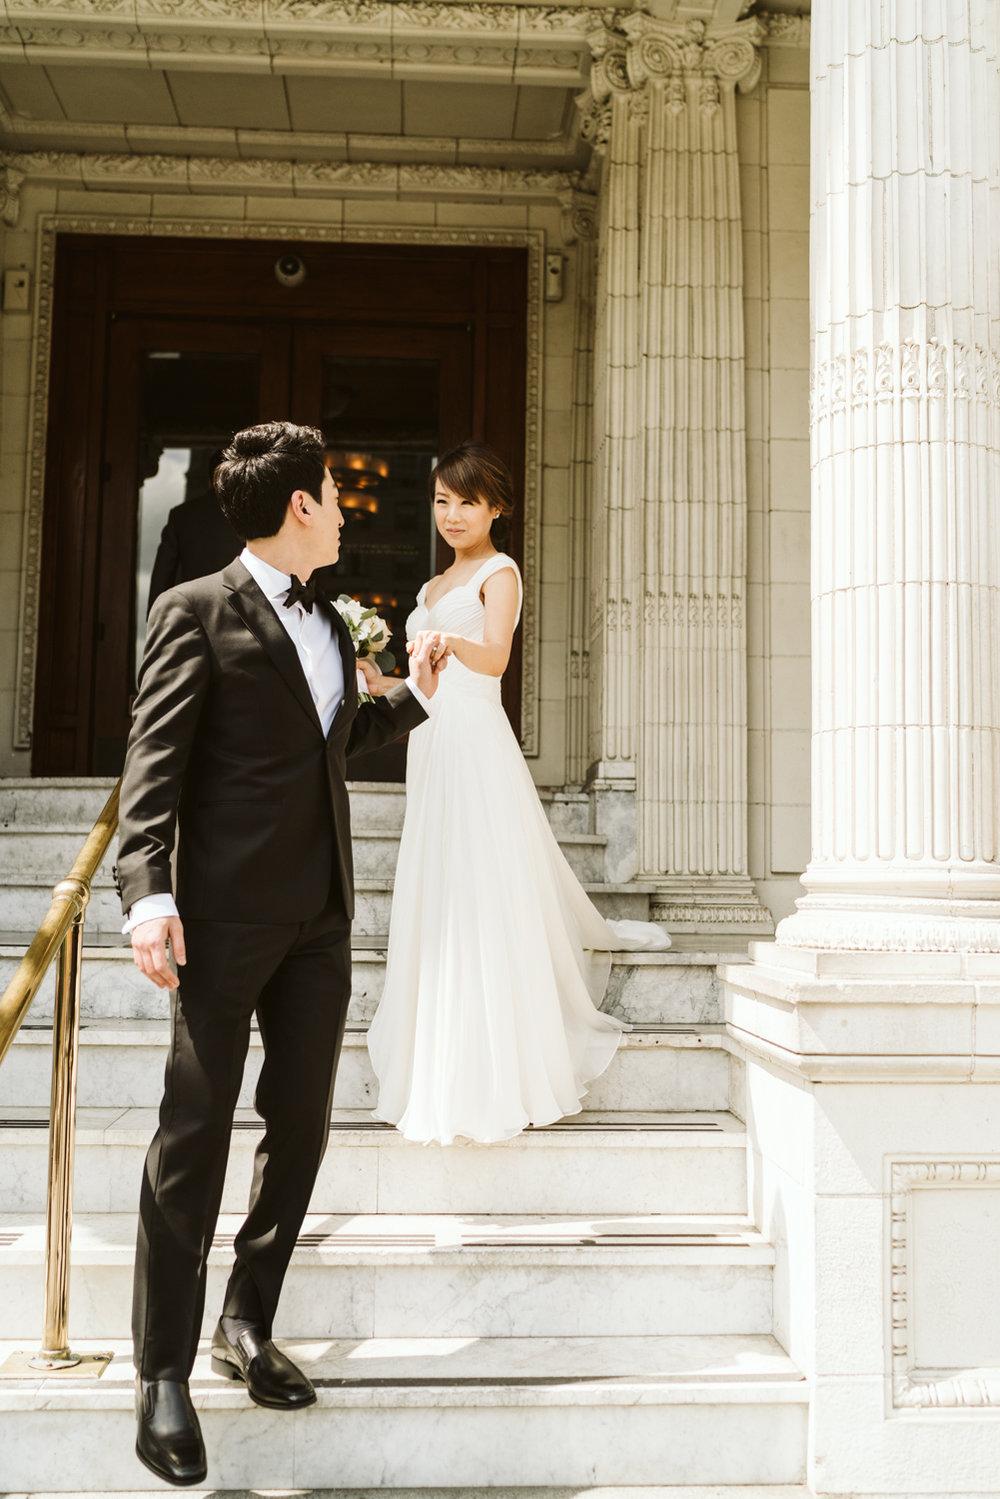 April Yentas Photography - Kristen & Jeff Wedding-19.jpg